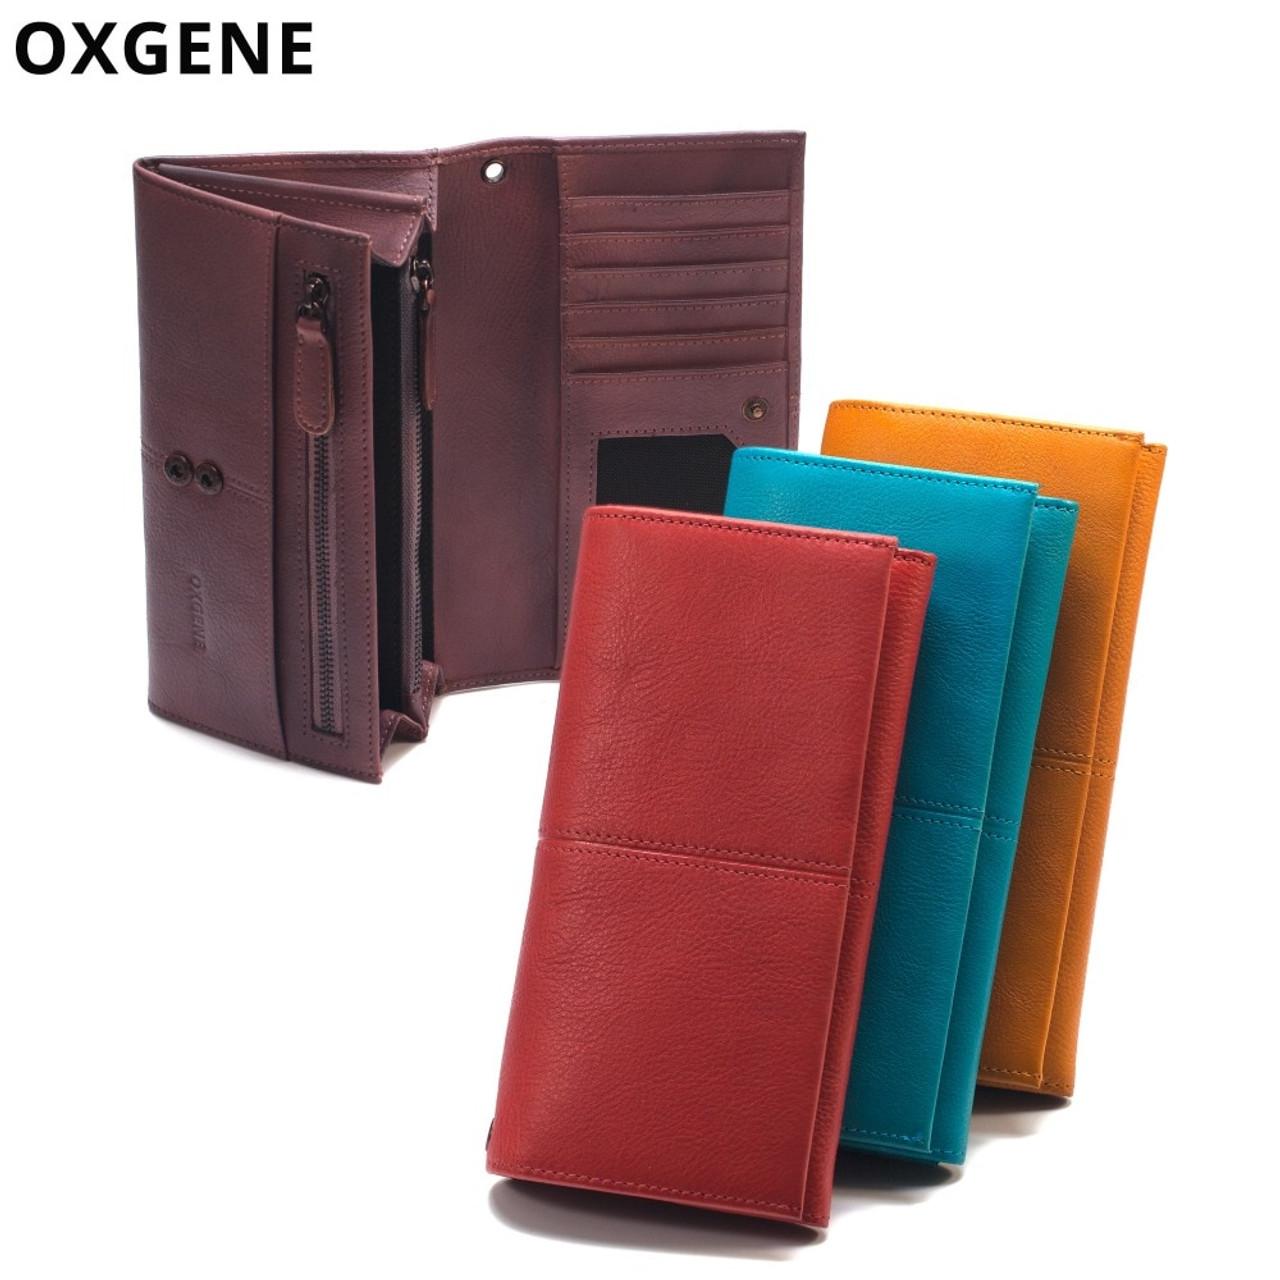 Women Wallet Long Genuine Leather Large Capacity Bags Ladies Travel Clutch  Girls Purse Phone Bag Woman Colors Zipper Purses New - OnshopDeals.Com f6cce49b63bd